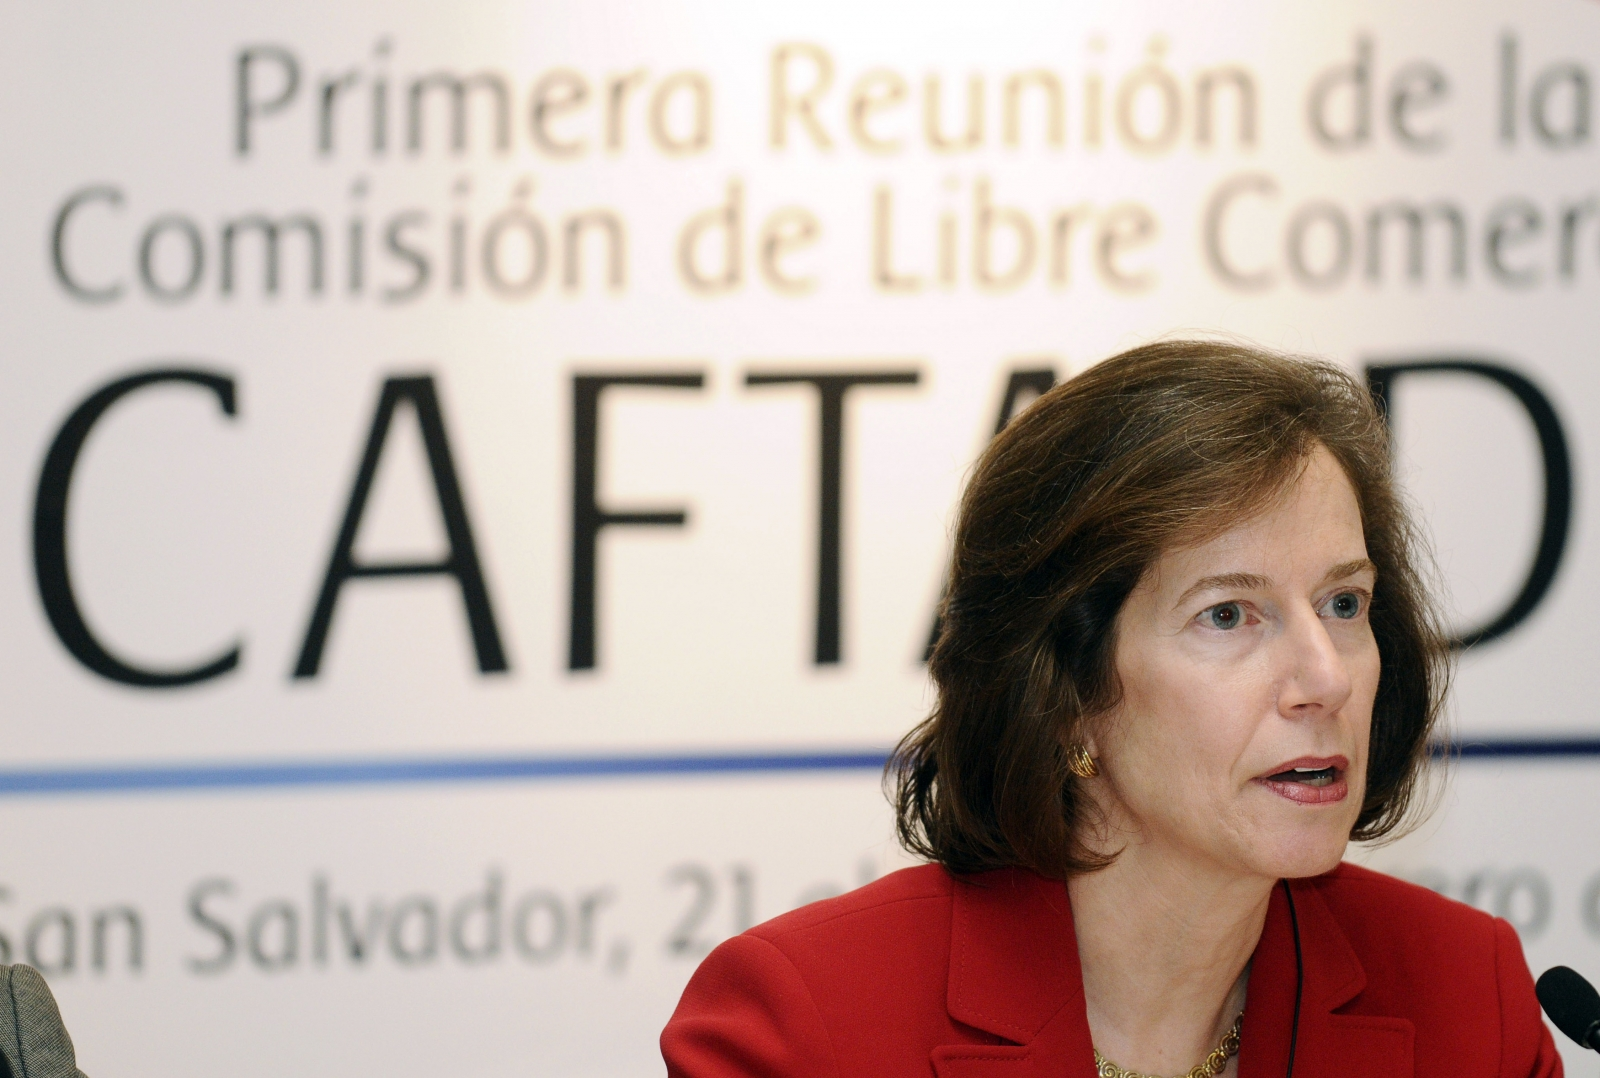 US Deputy Trade Representative Miriam Sapiro